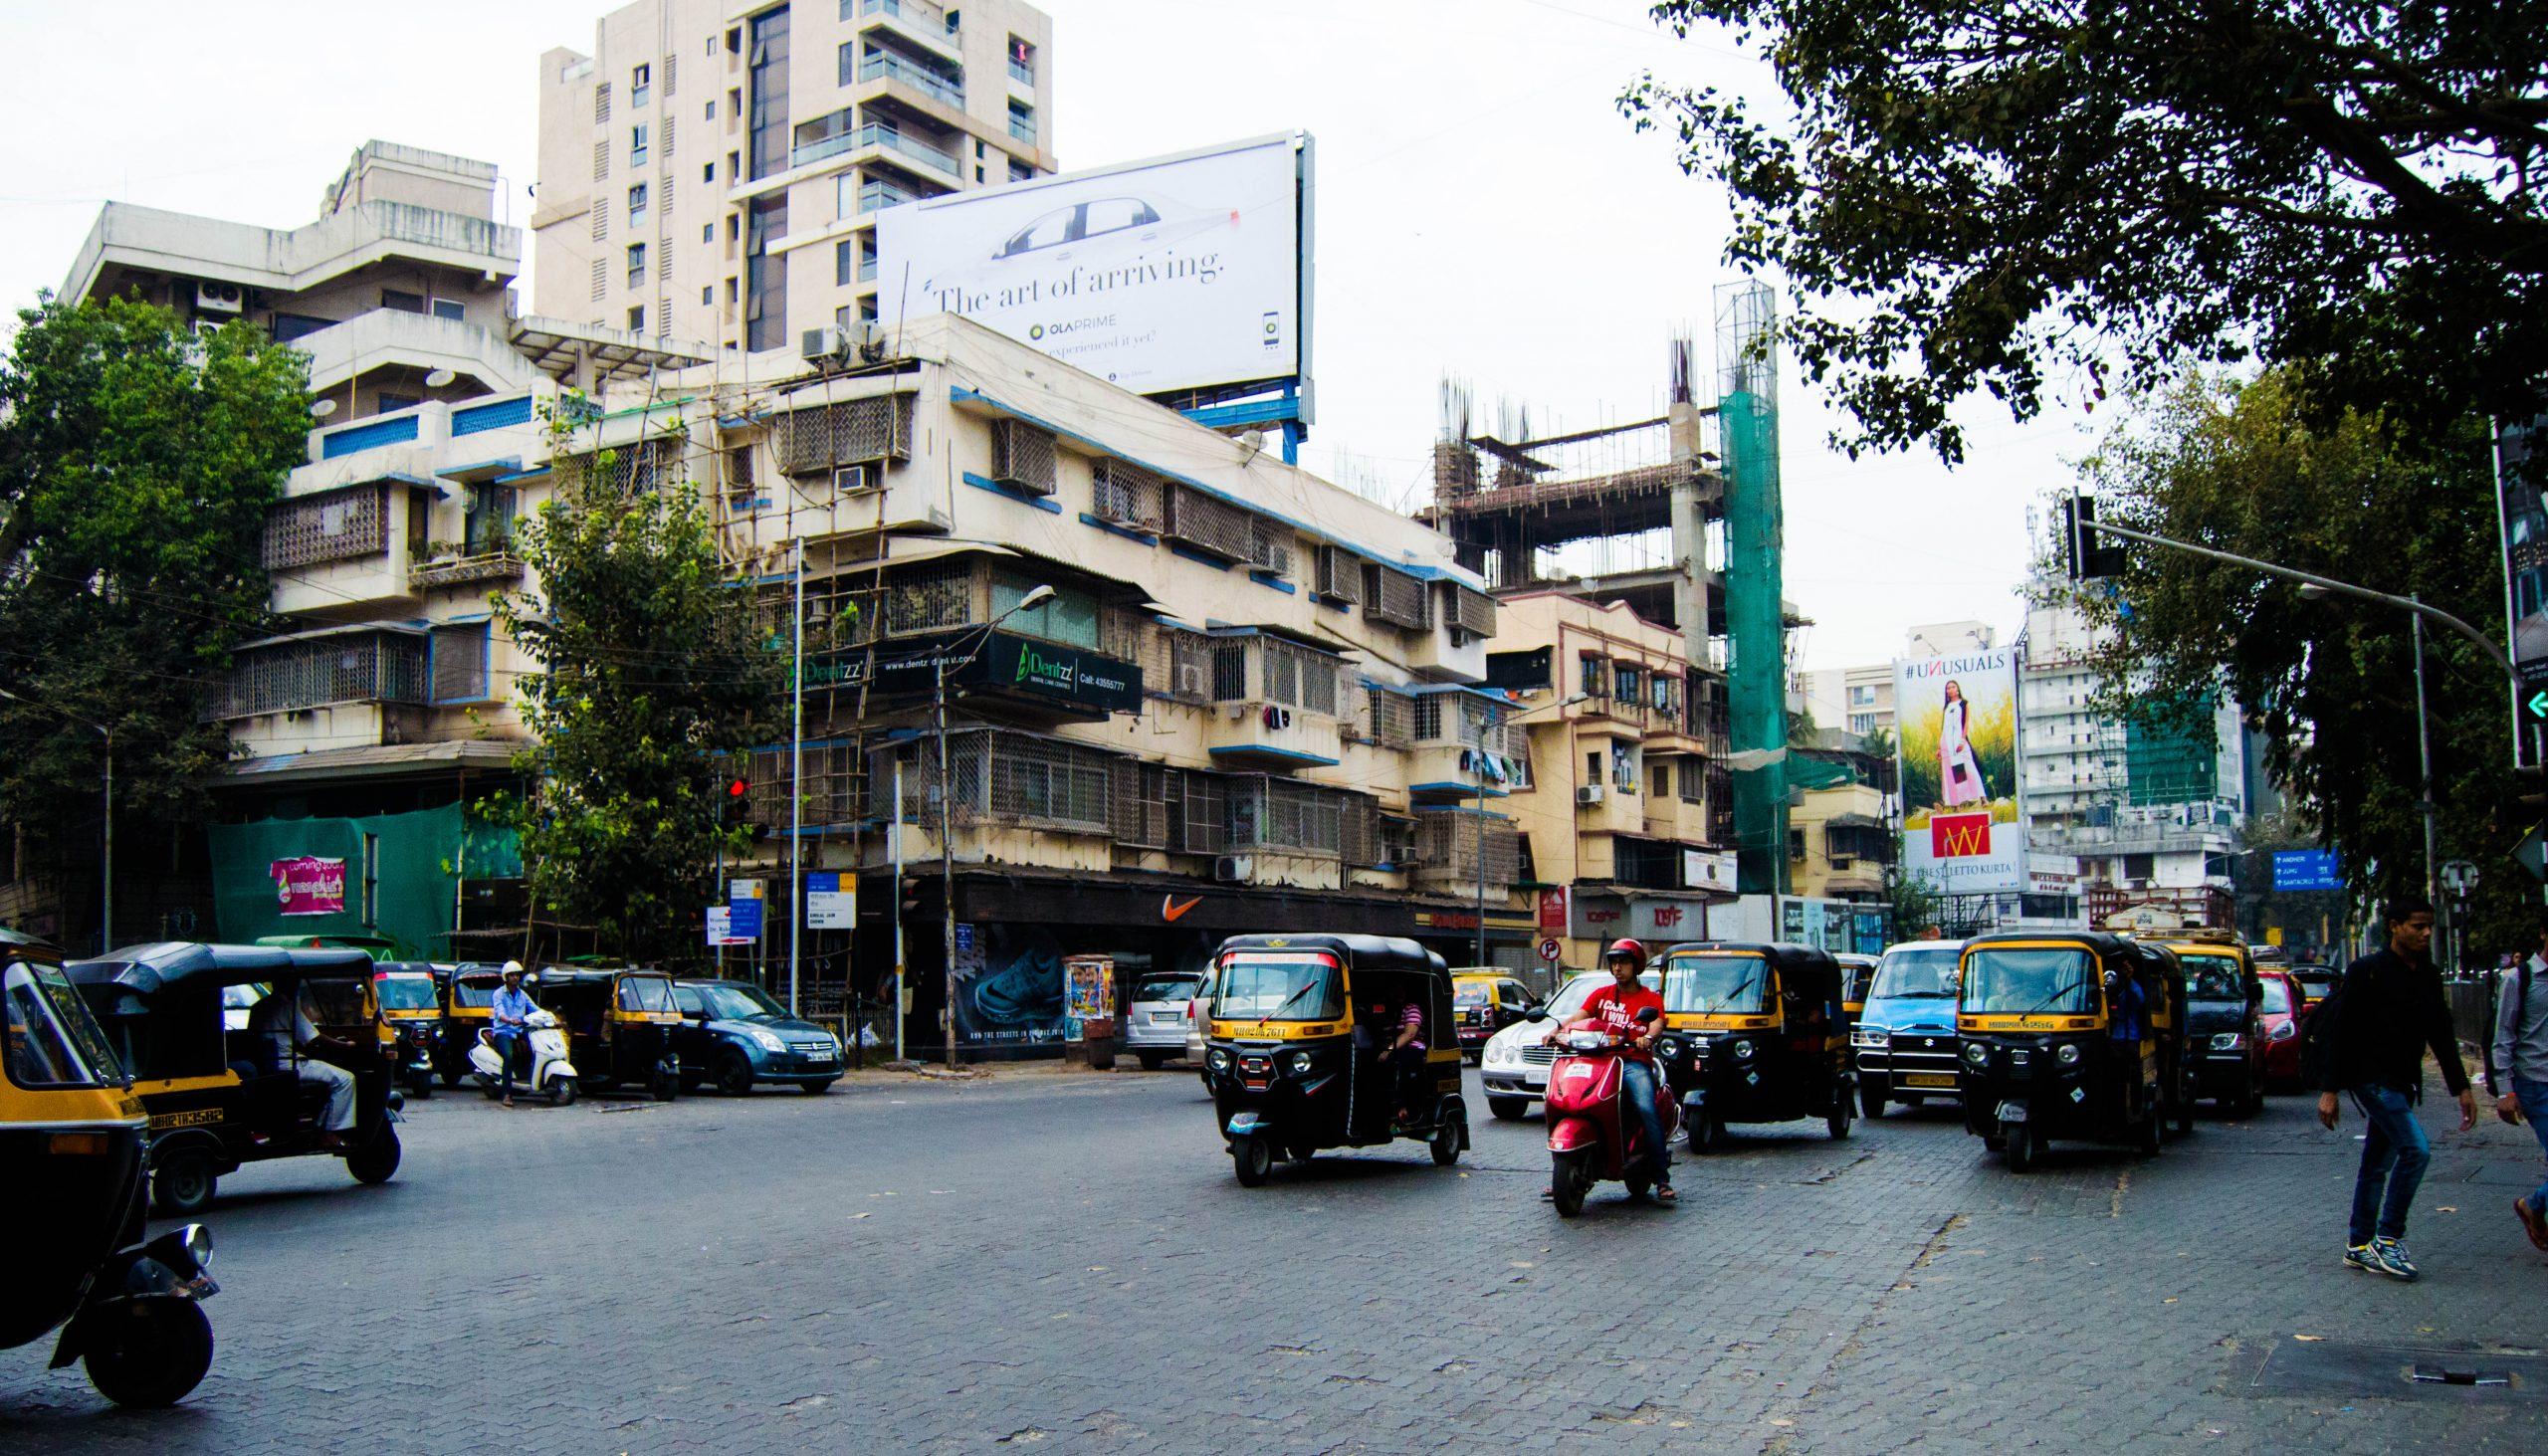 Linking Road Shopping Place in Mumbai